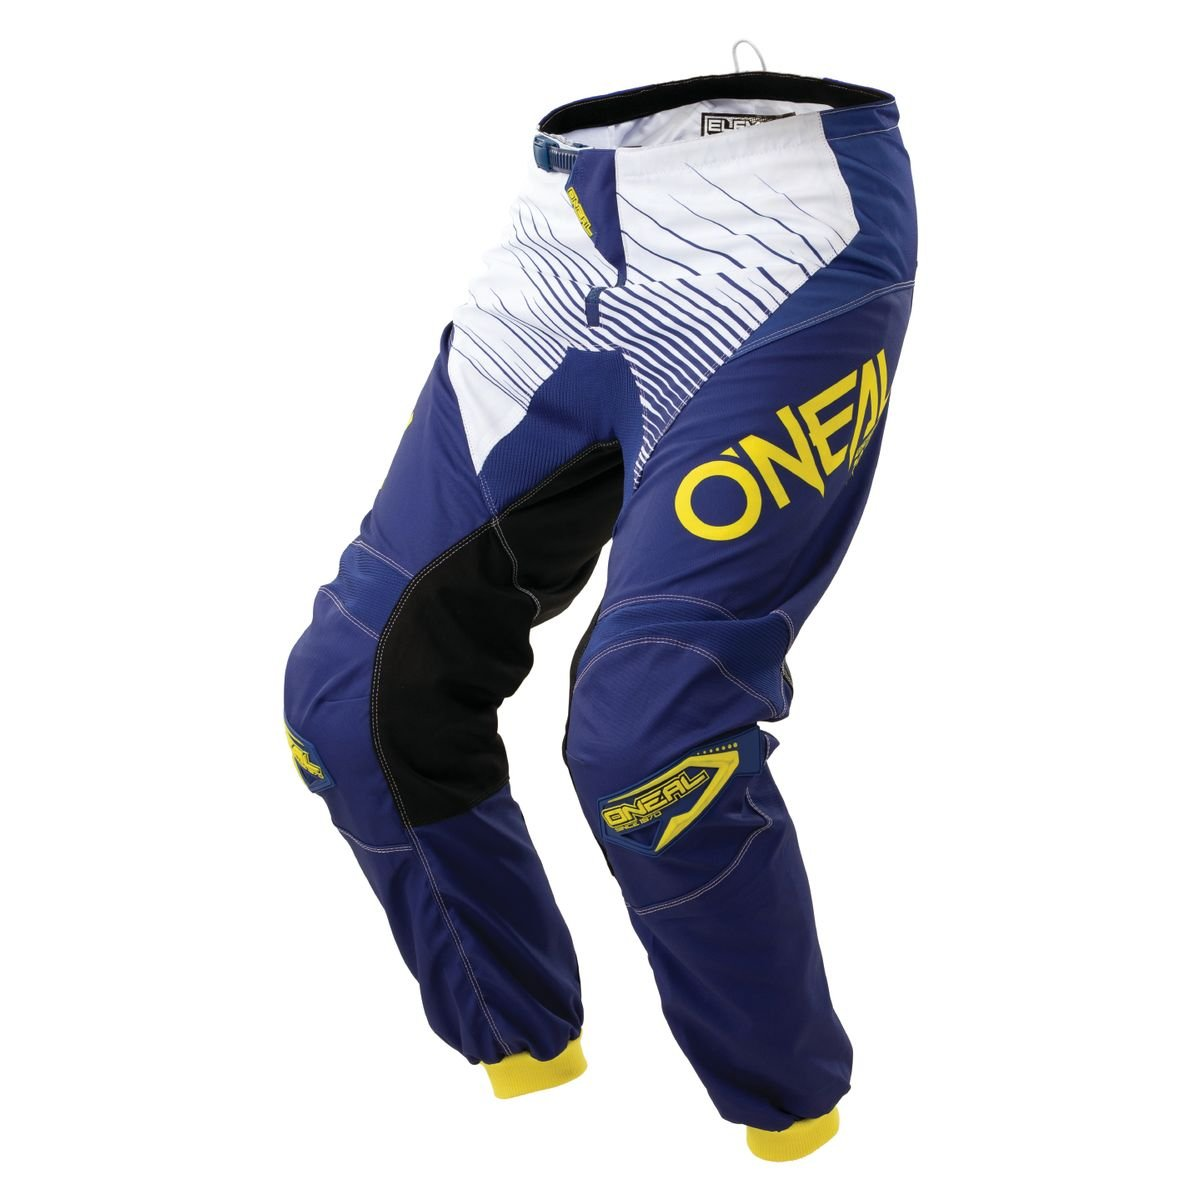 O'Neal Youth Element Racewear Pant (Blue/Yellow, Size 12/14) O' Neal 0108-526